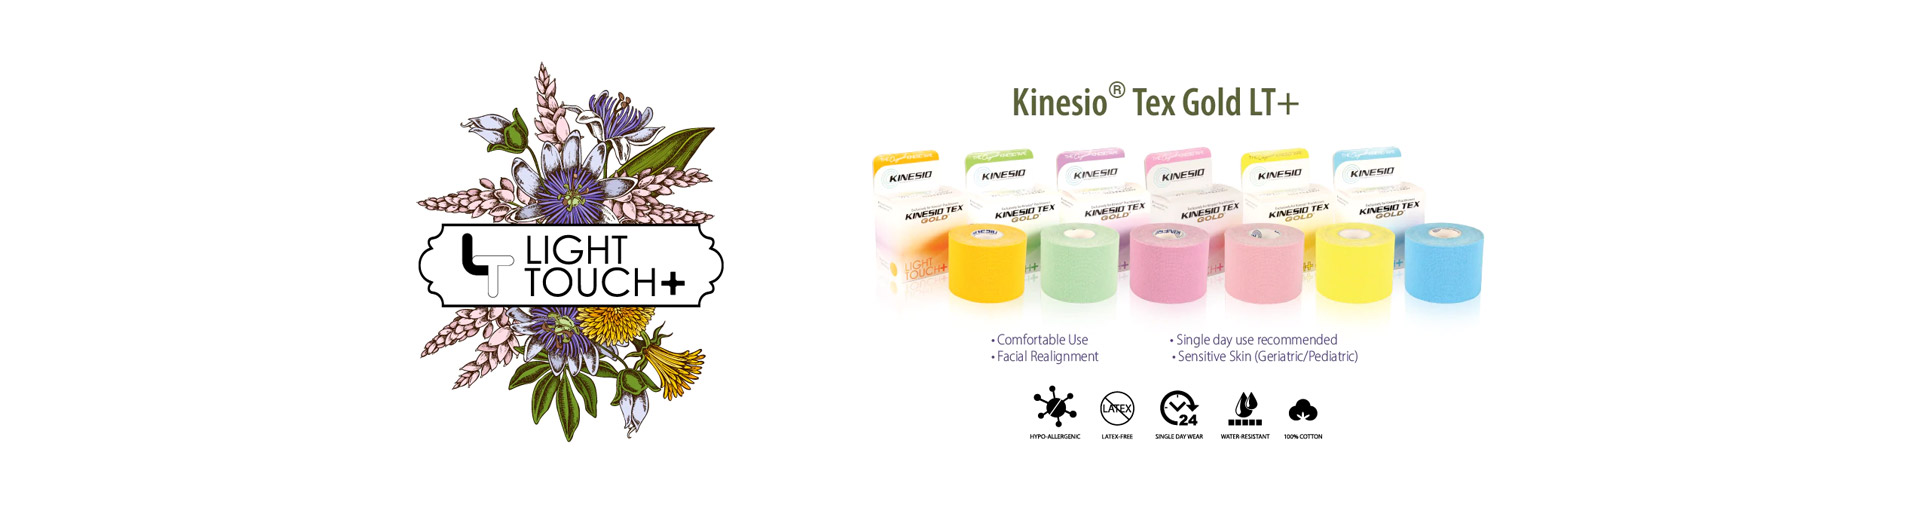 Kinesio Tex Gold Light Touch + Header